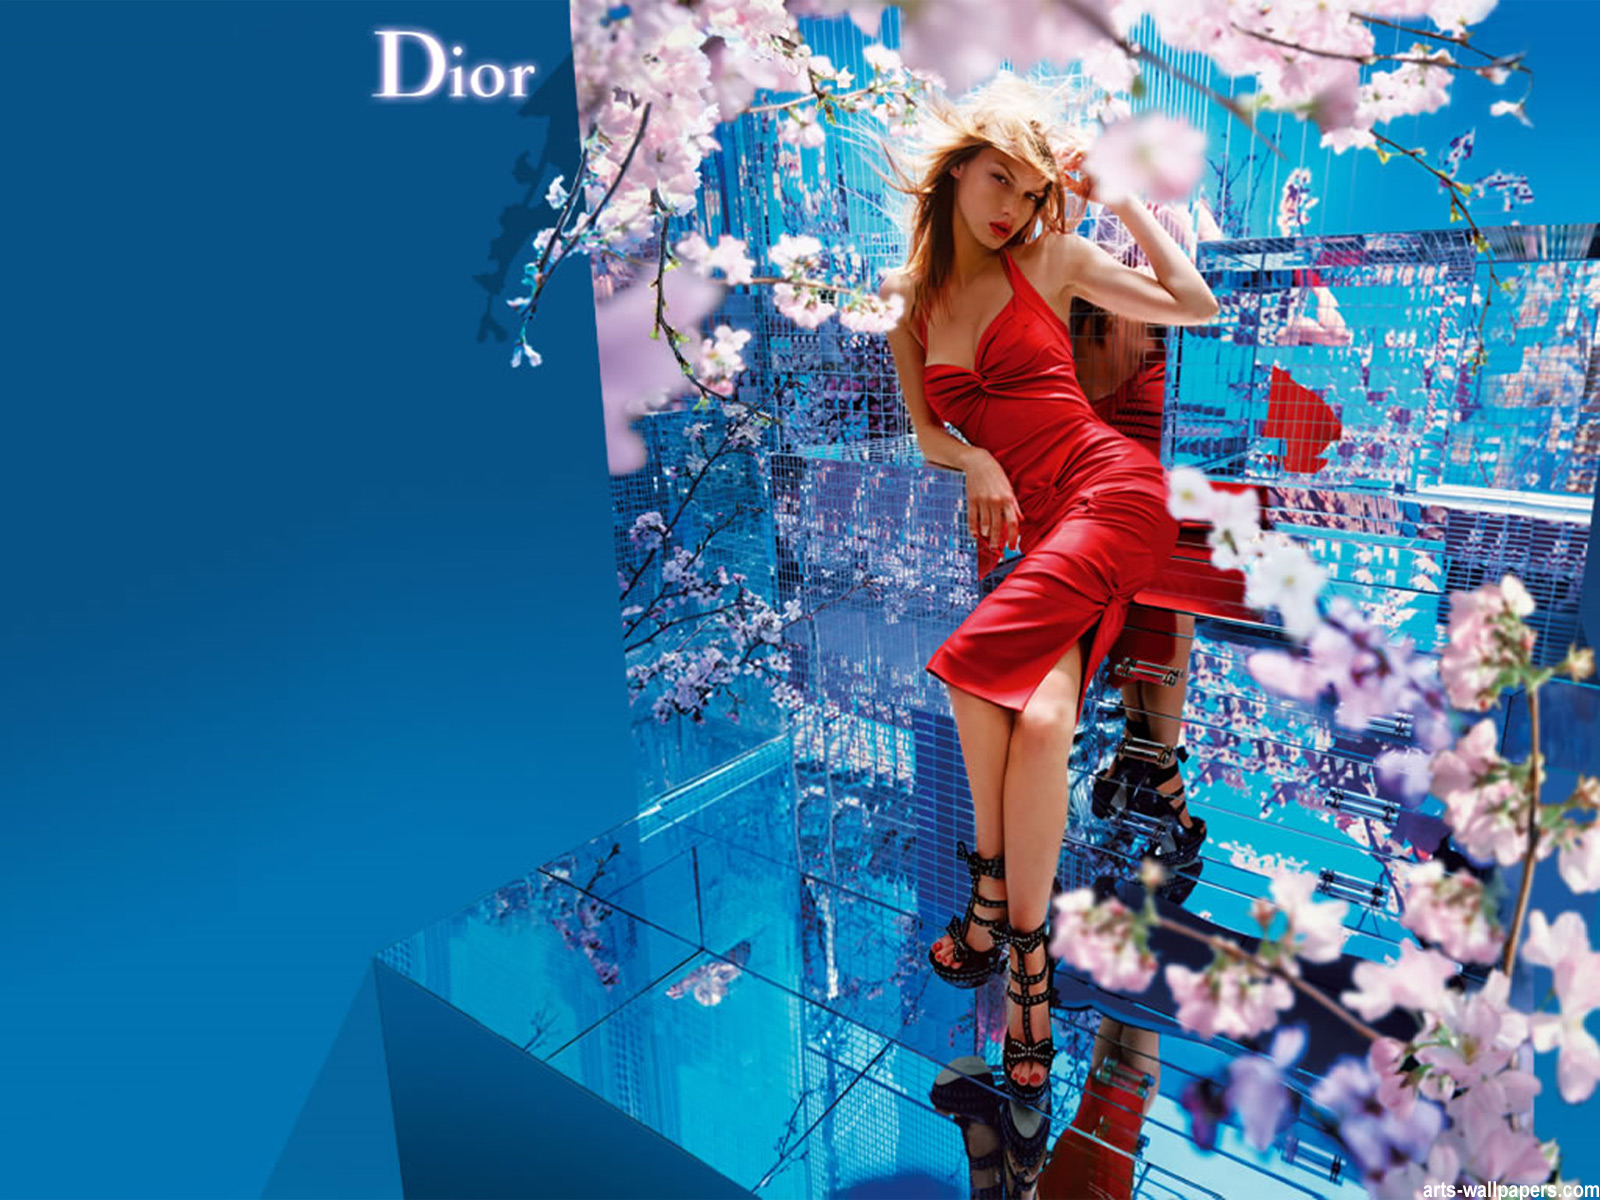 High Fashion Desktop Wallpaper - WallpaperSafari